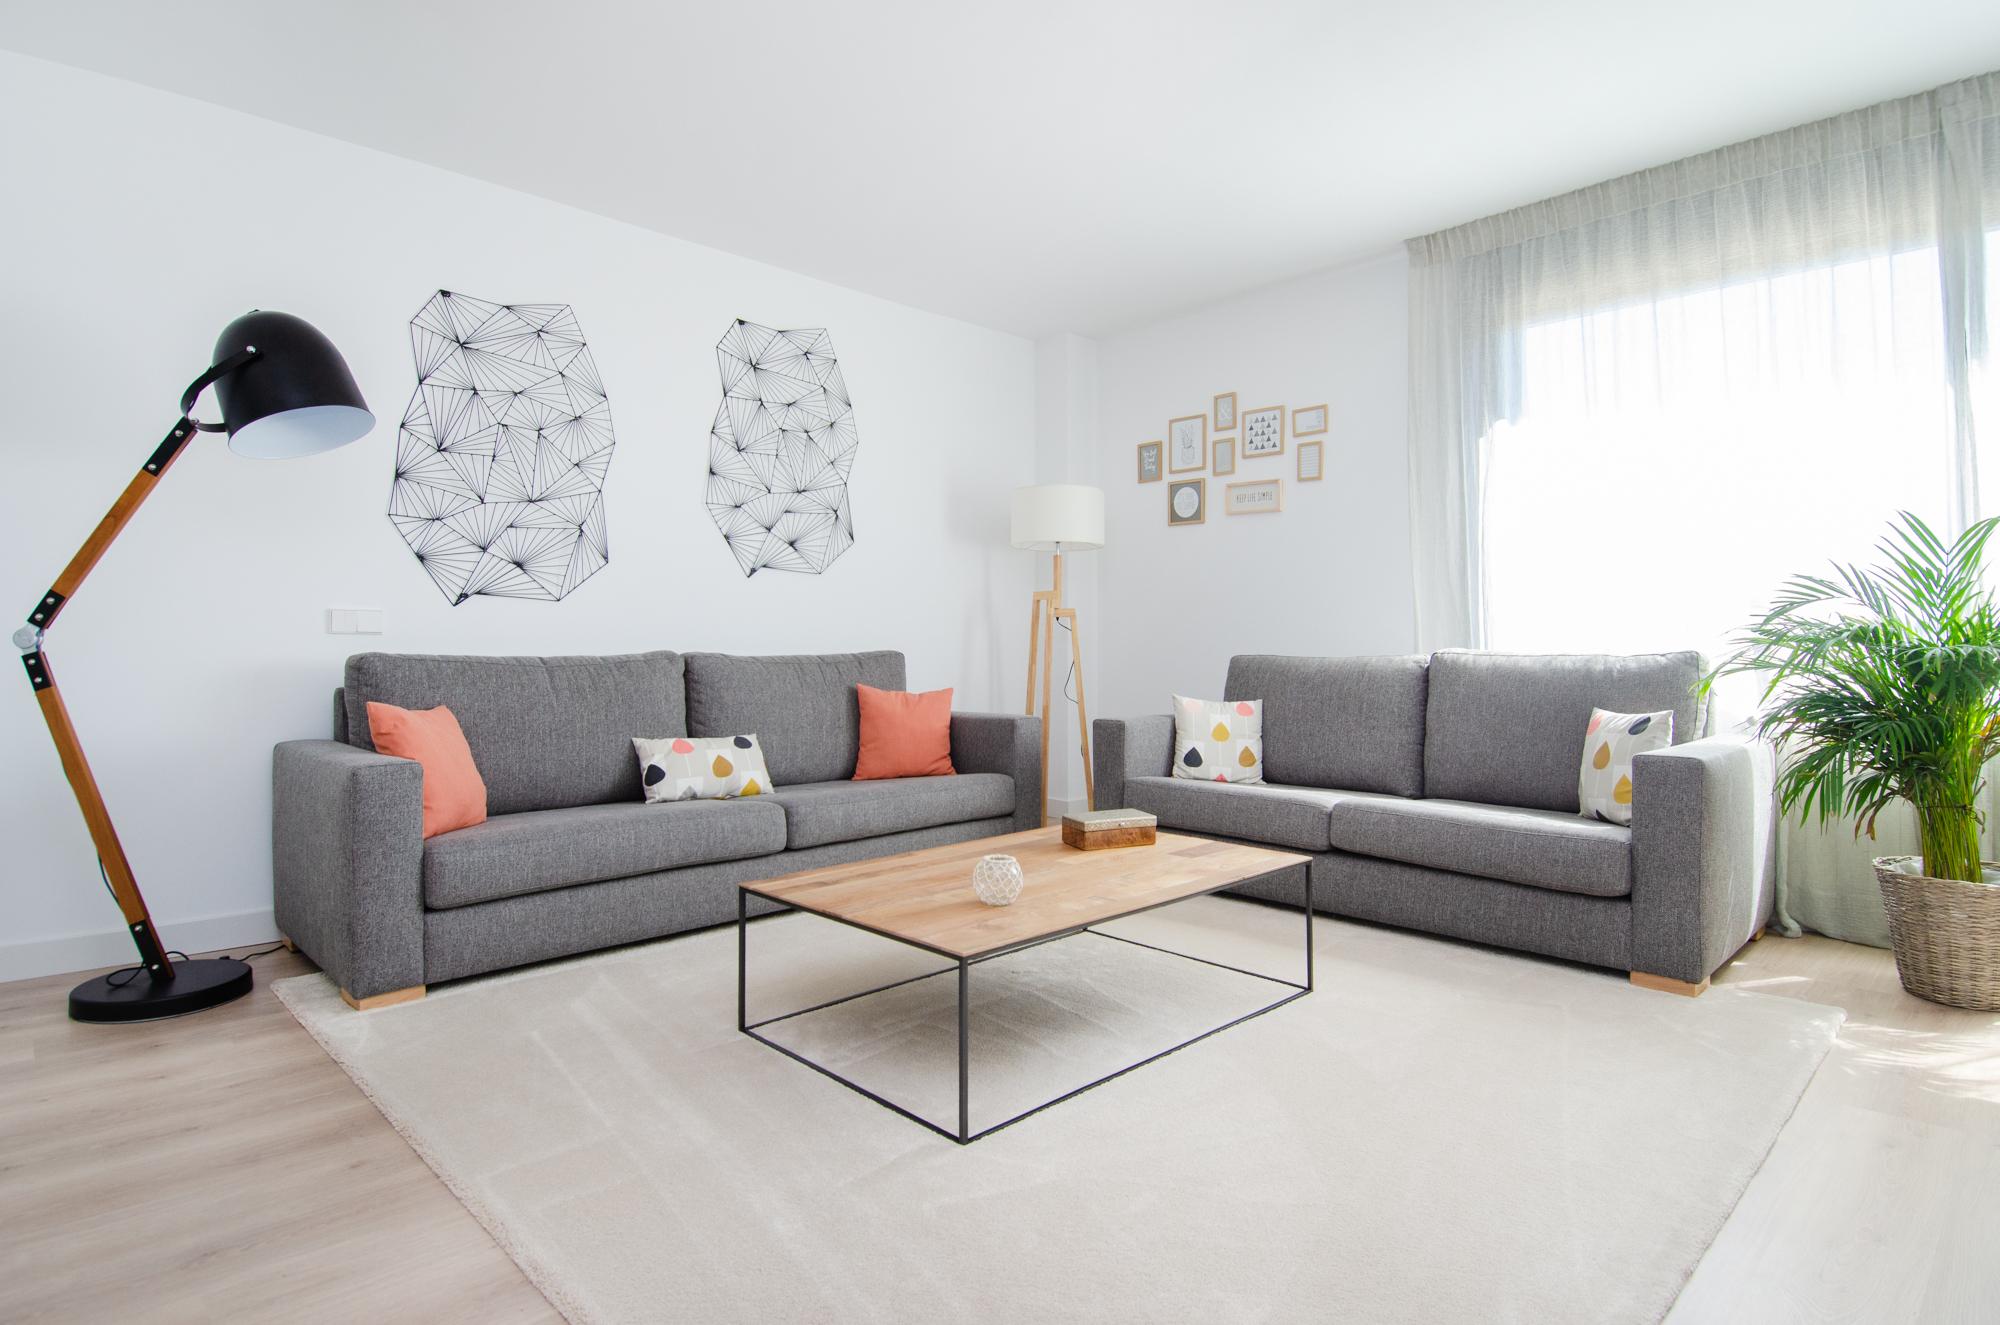 interiorismo-decoracion-ana-de-cabo-reforma-piso-santa-eugenia (5)